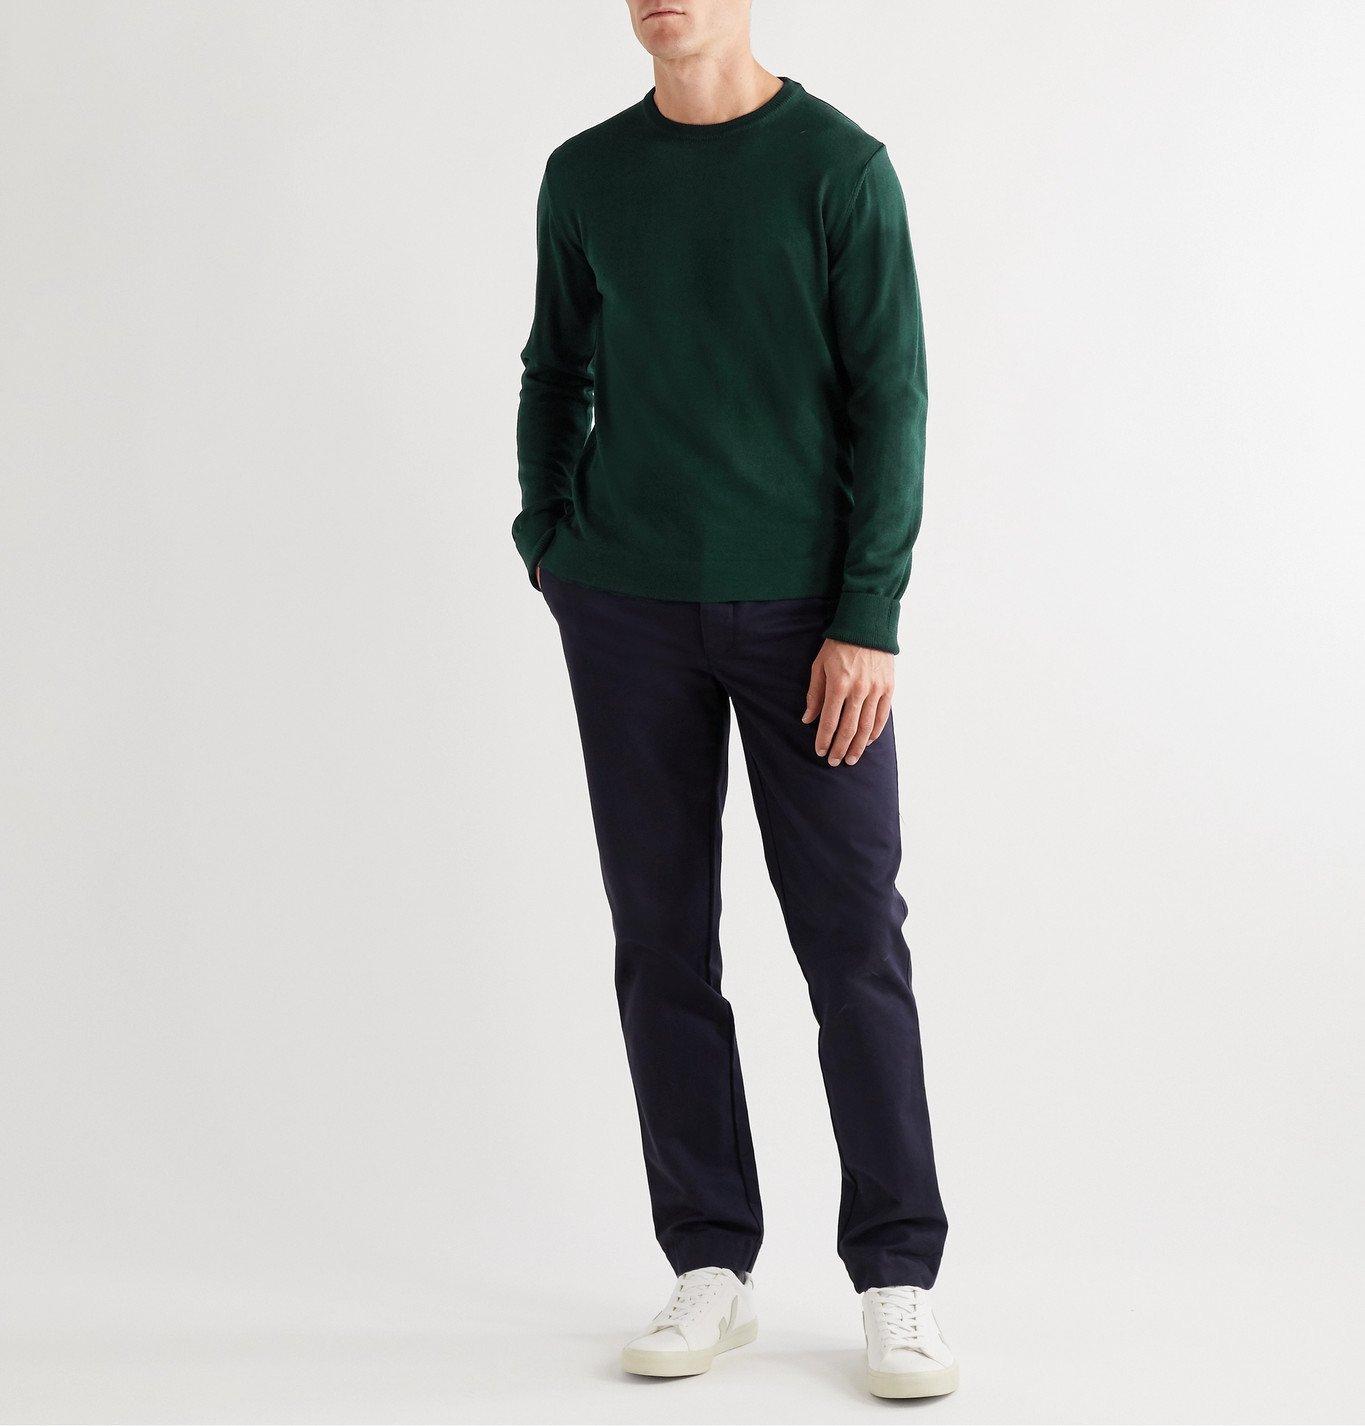 Officine Generale - Nina Slim-Fit Virgin Wool Sweater - Green